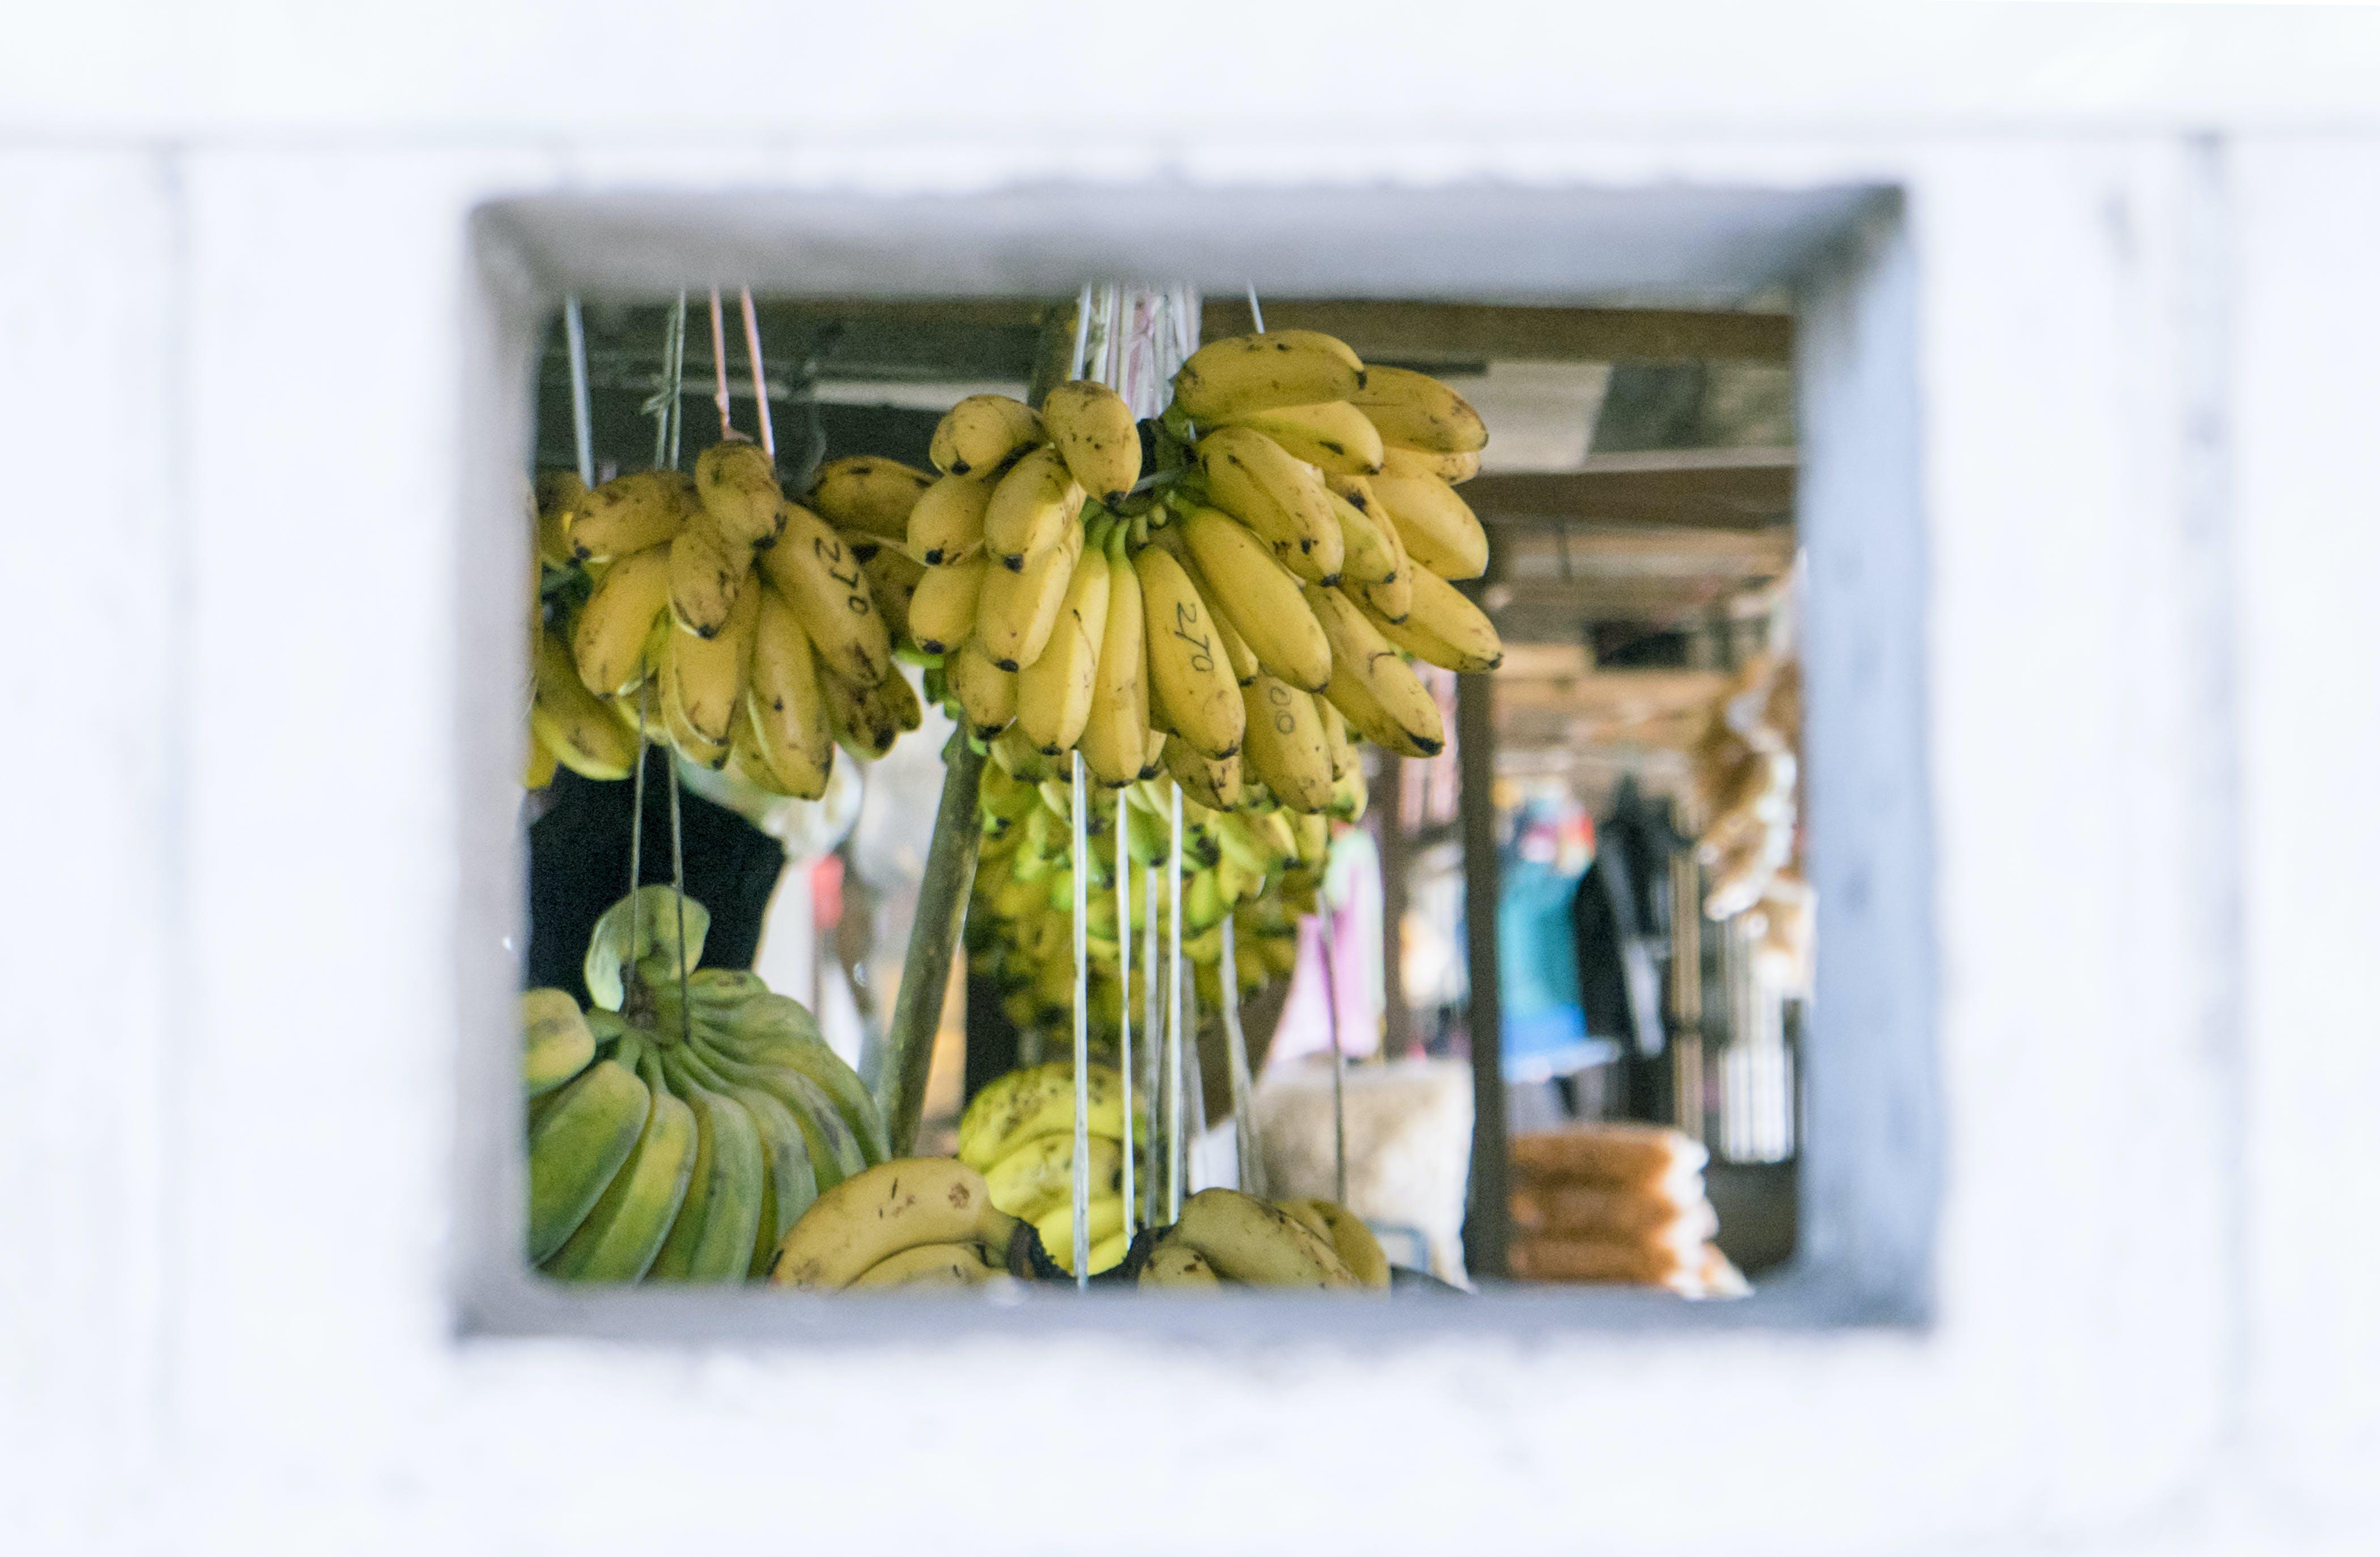 Bunch of Hanged Bananas